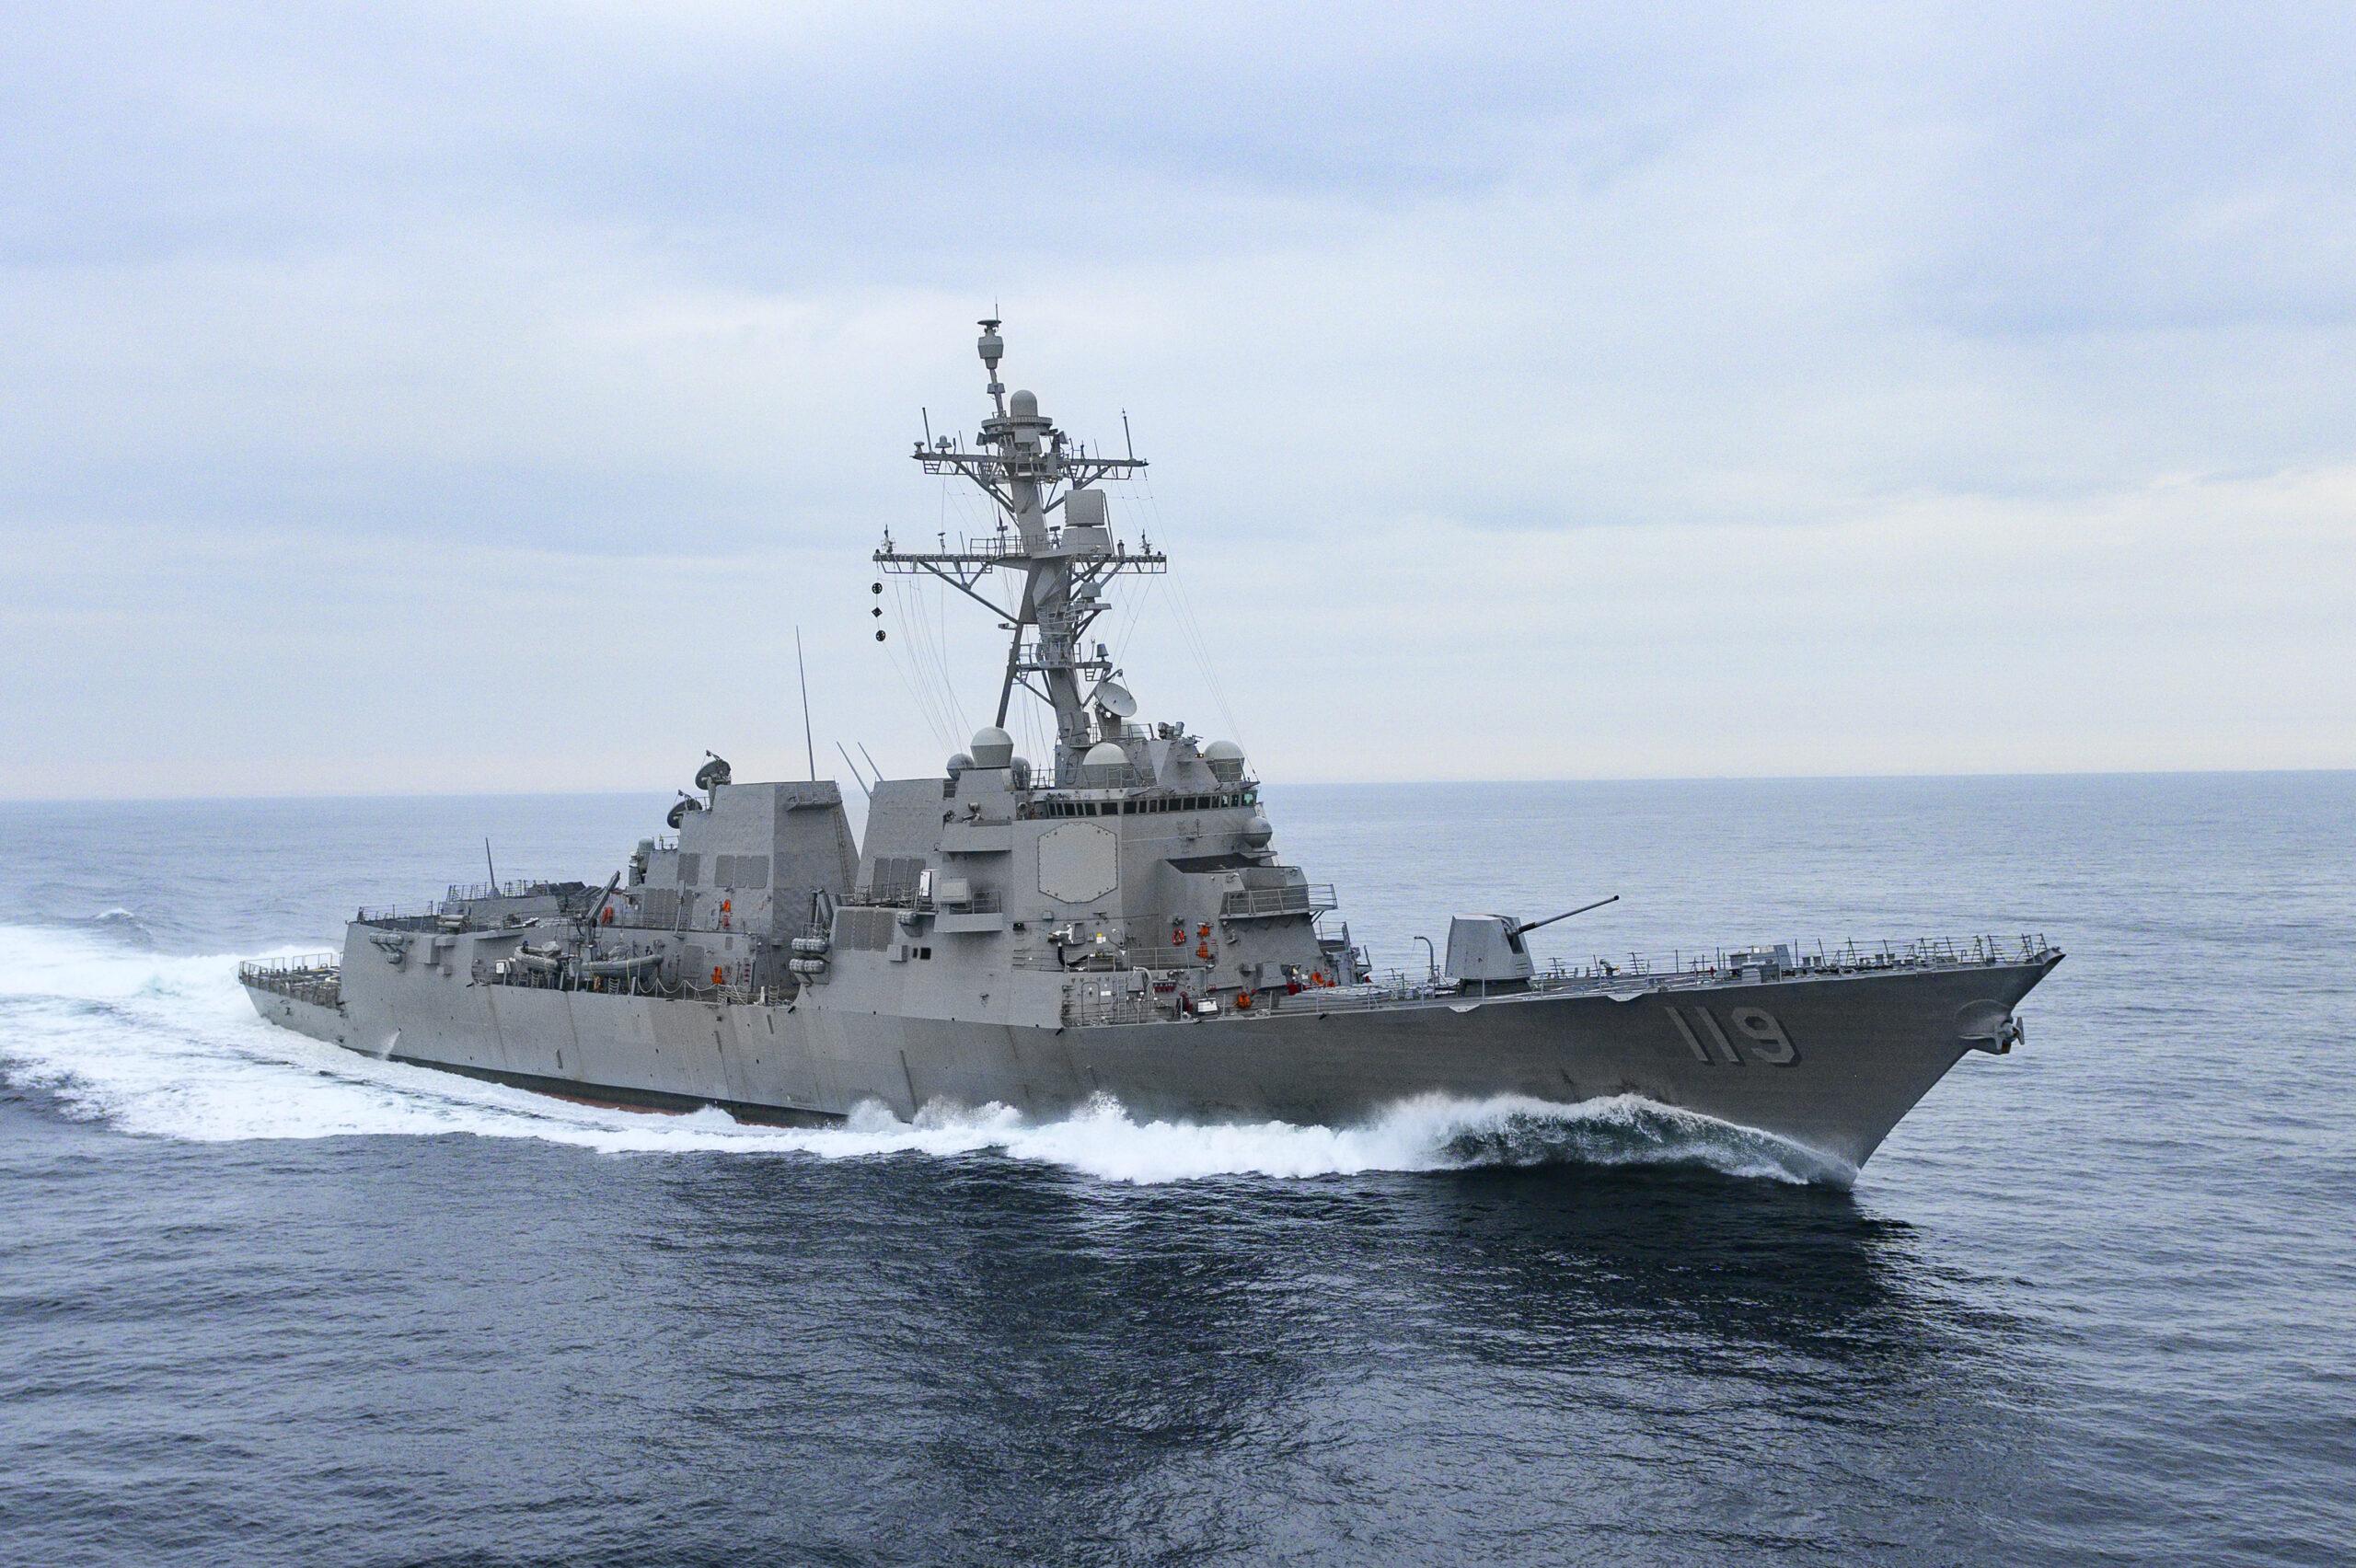 NAVANTIA has Won a Maintenance Contract for the US Navy